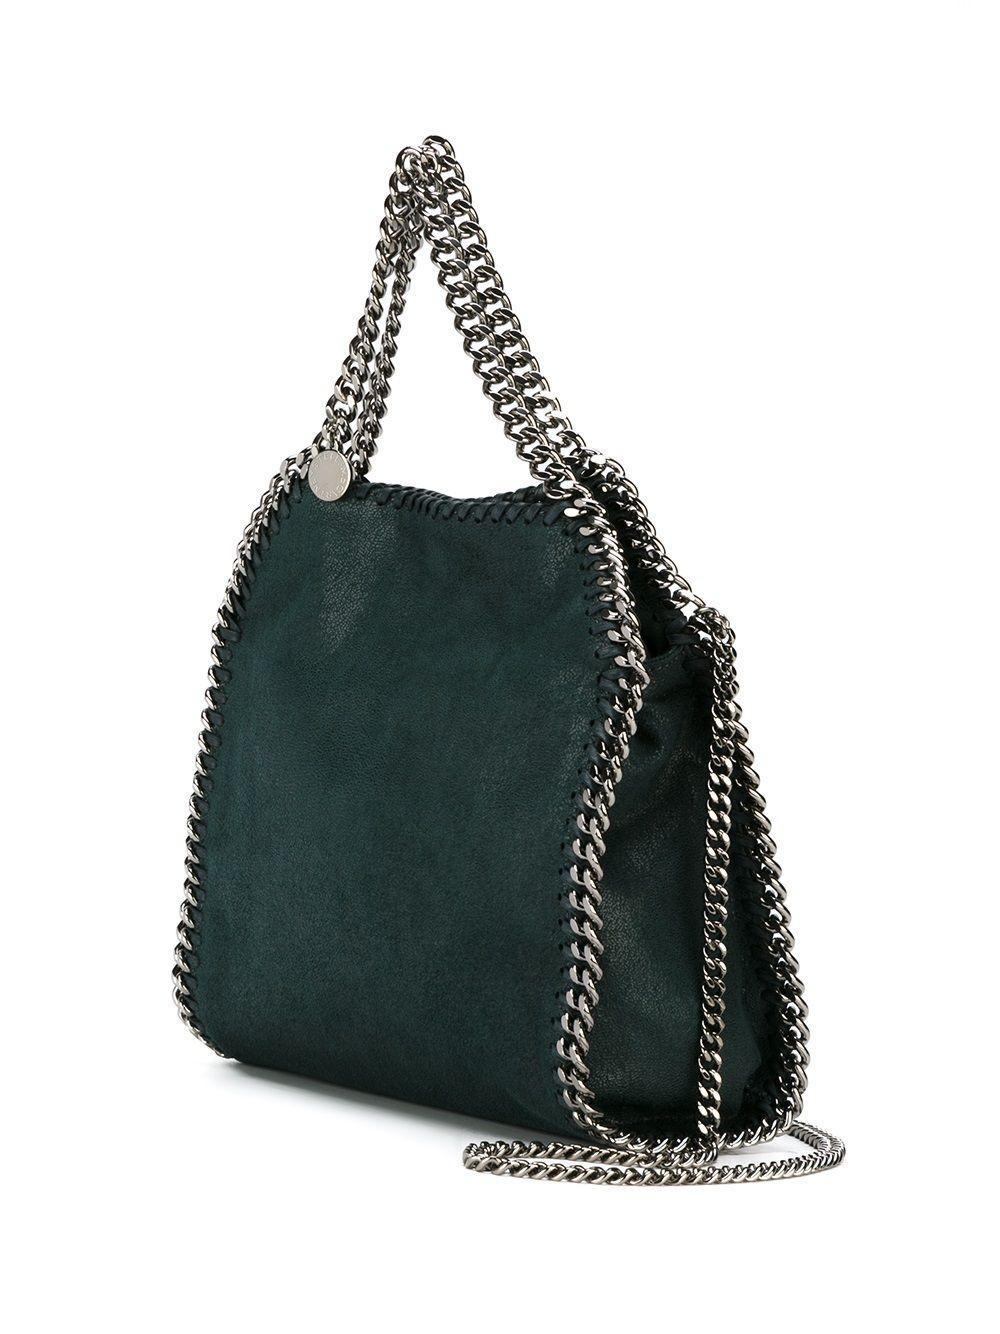 Stella McCartney Leather 'falabella' Tote in Green